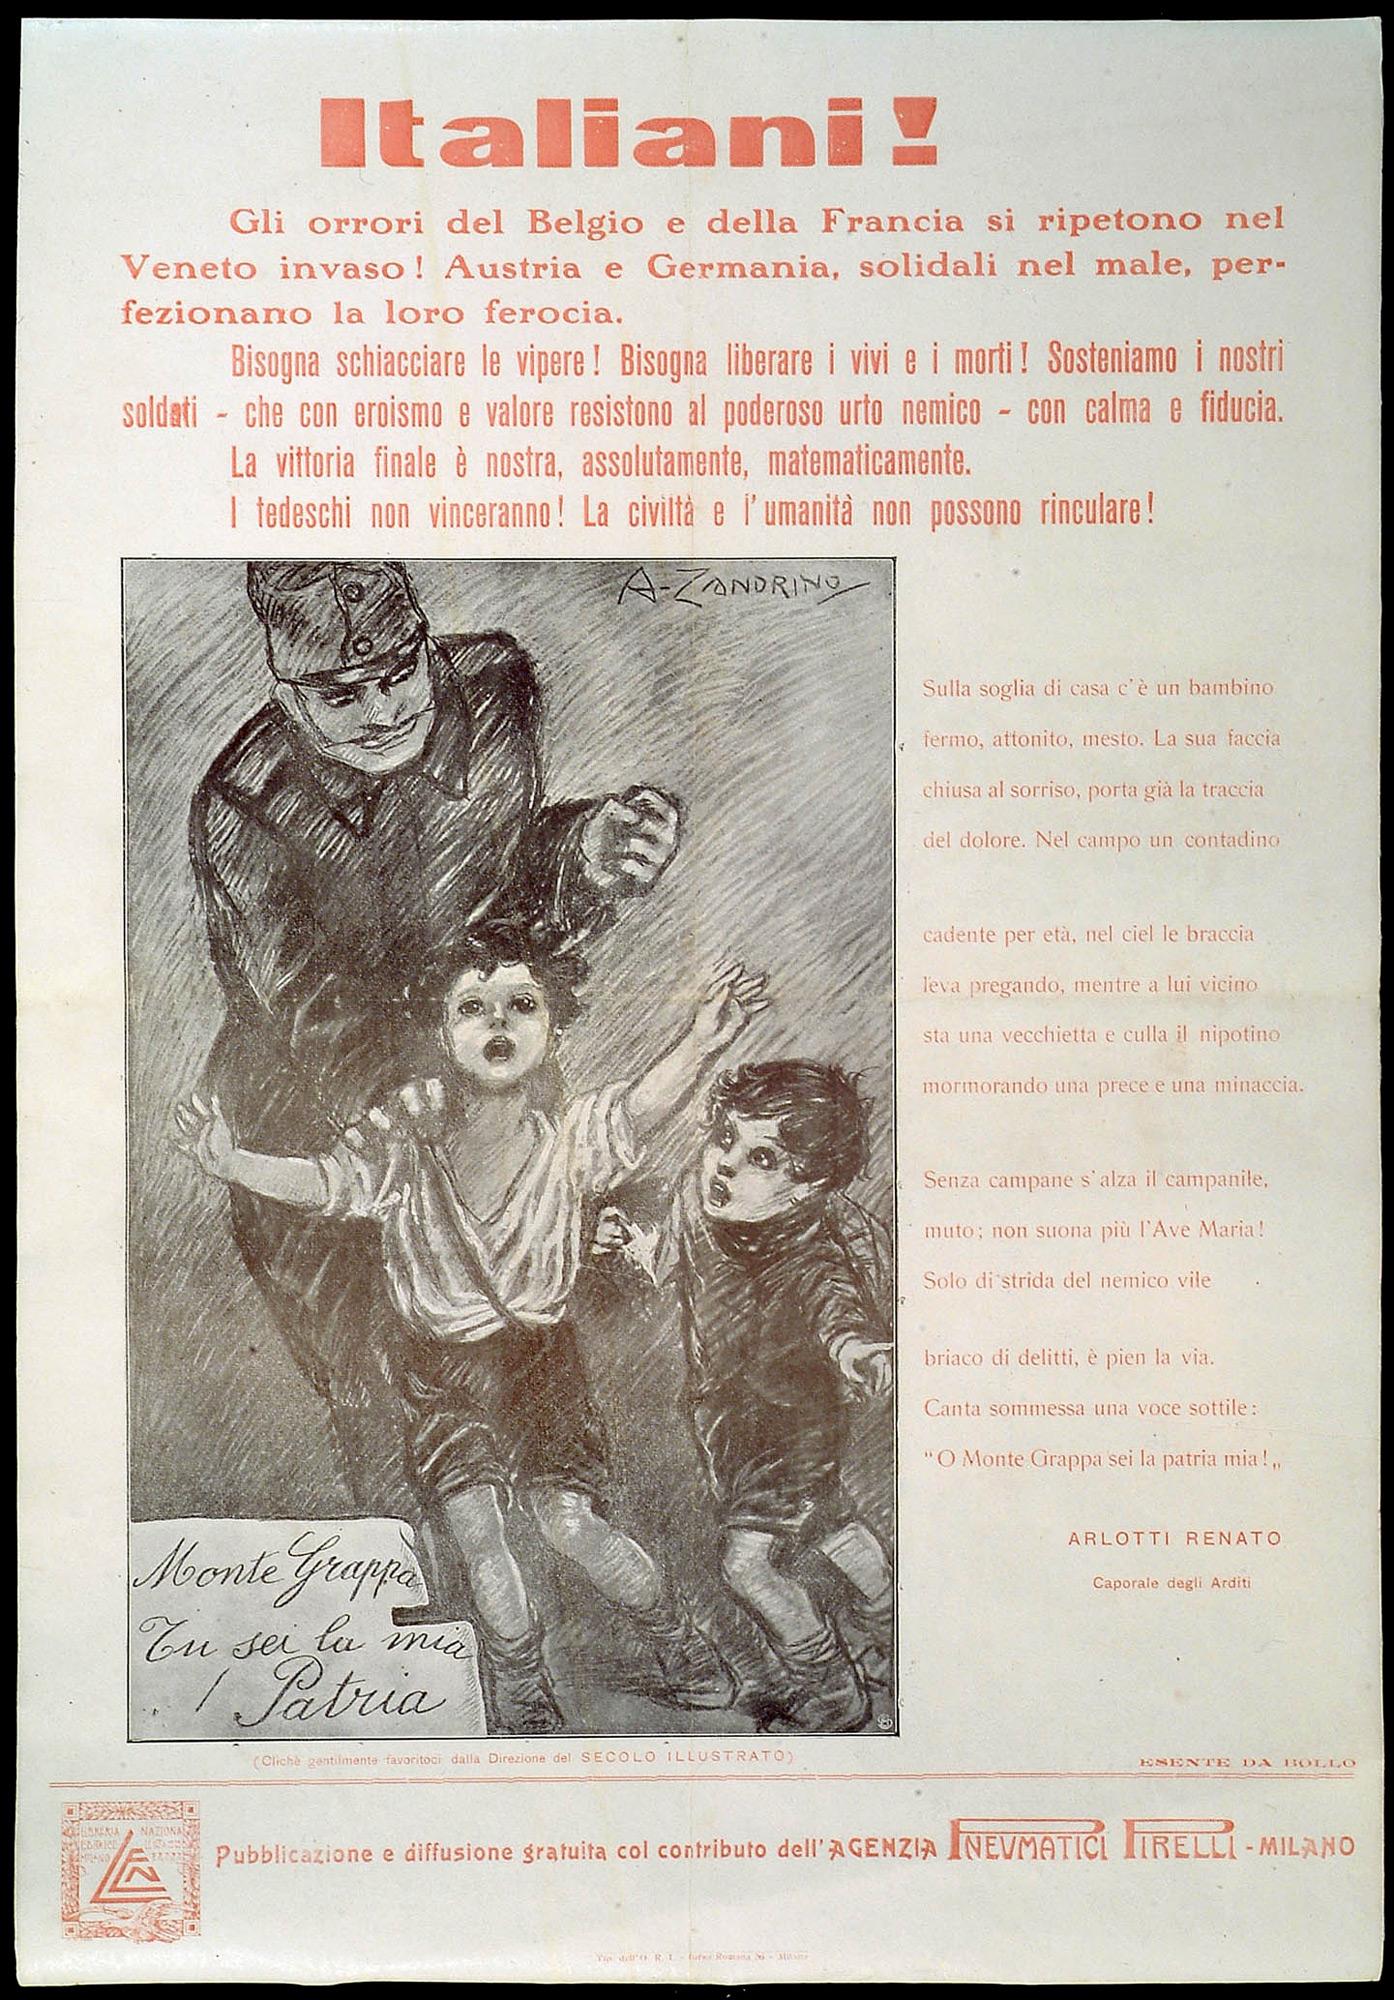 Propaganda poster, created by Renato Arlotti and Adele Zandrino, showing Germans as barbaric killers, 1918.